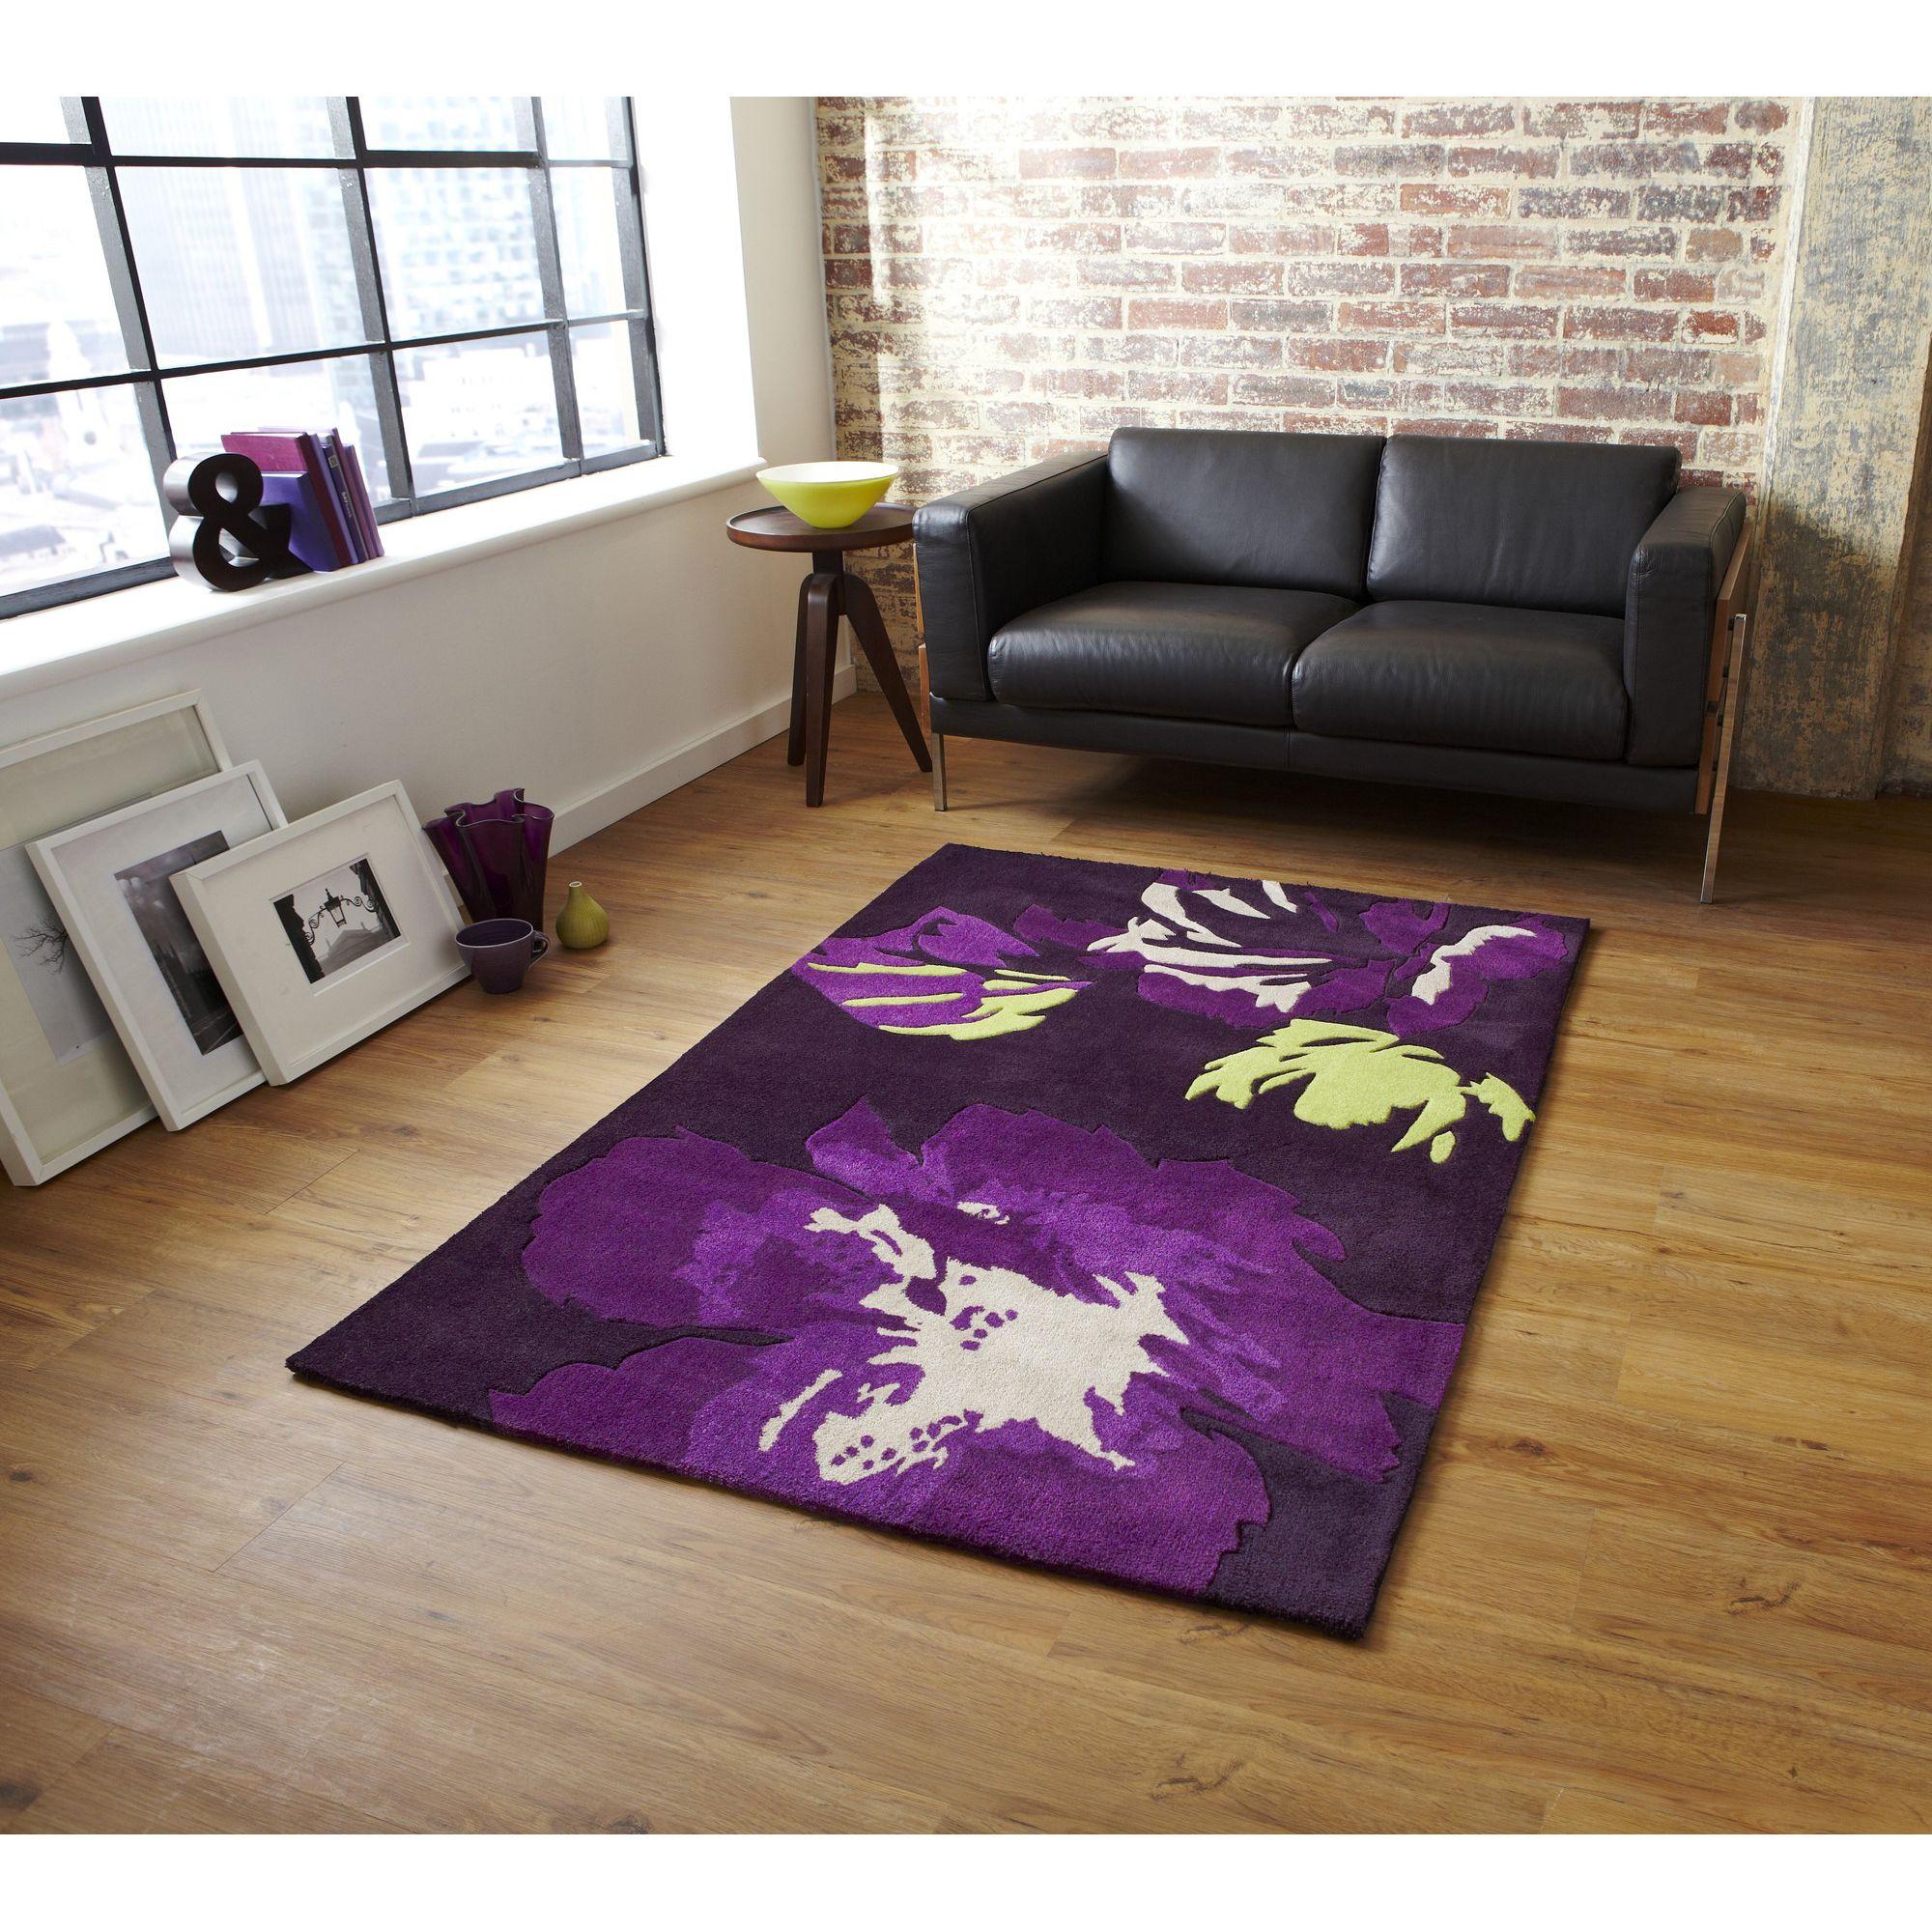 Oriental Carpets & Rugs Hong Kong 2827 Purple/Green Rug - 150cm x 230cm